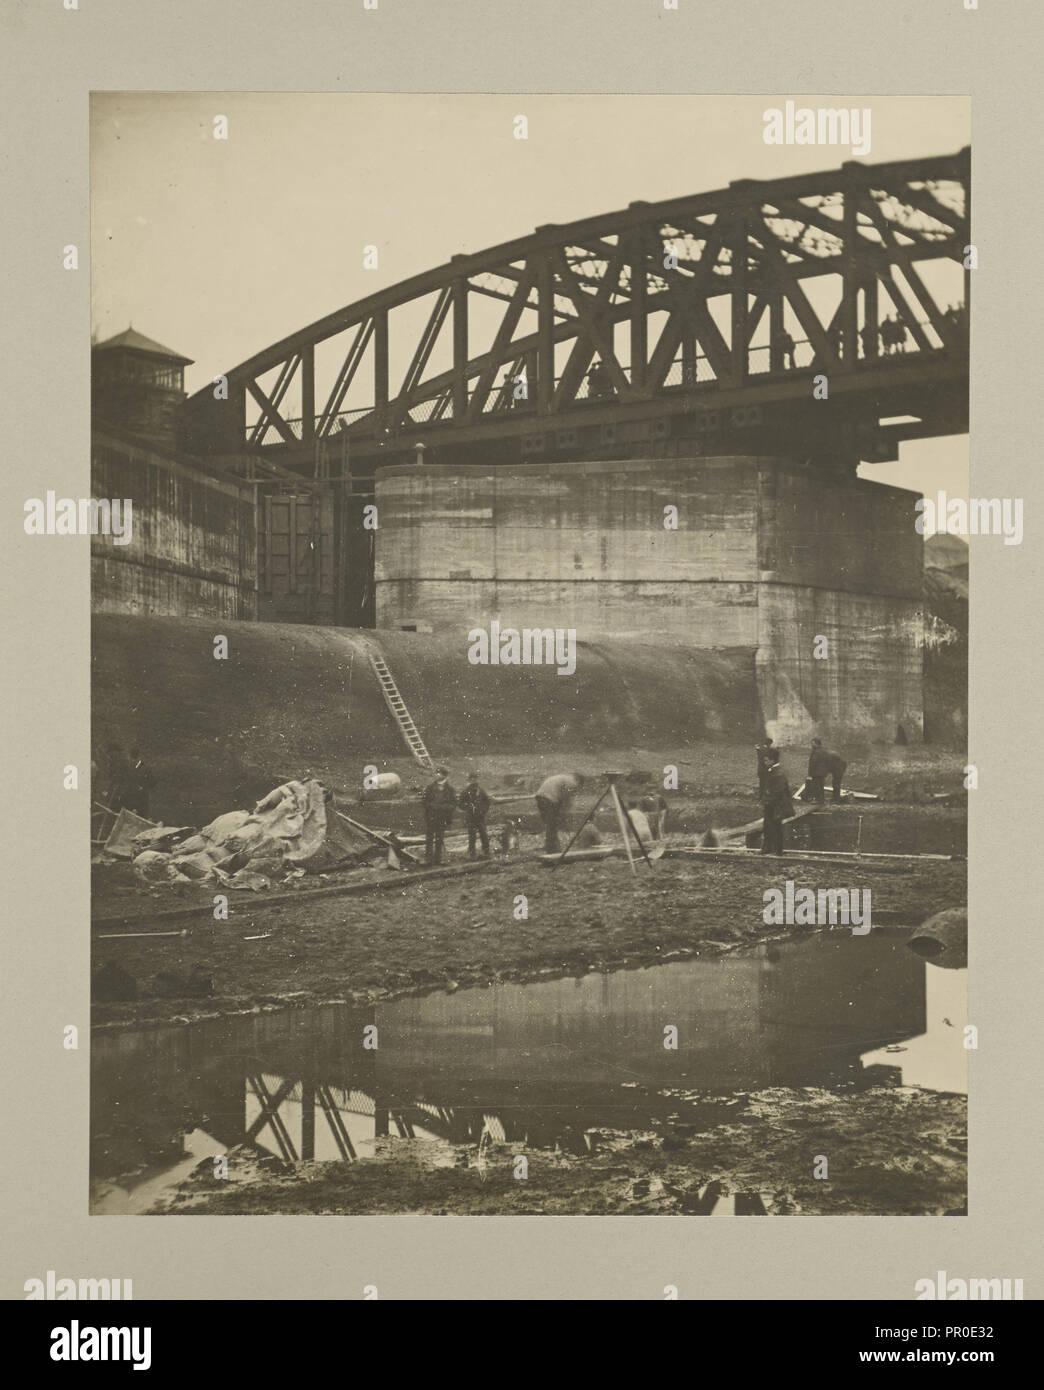 Stockton Heath - Cutting under Swing Bridge; G. Herbert & Horace C. Bayley; Manchester, England; negative November 1893; print - Stock Image